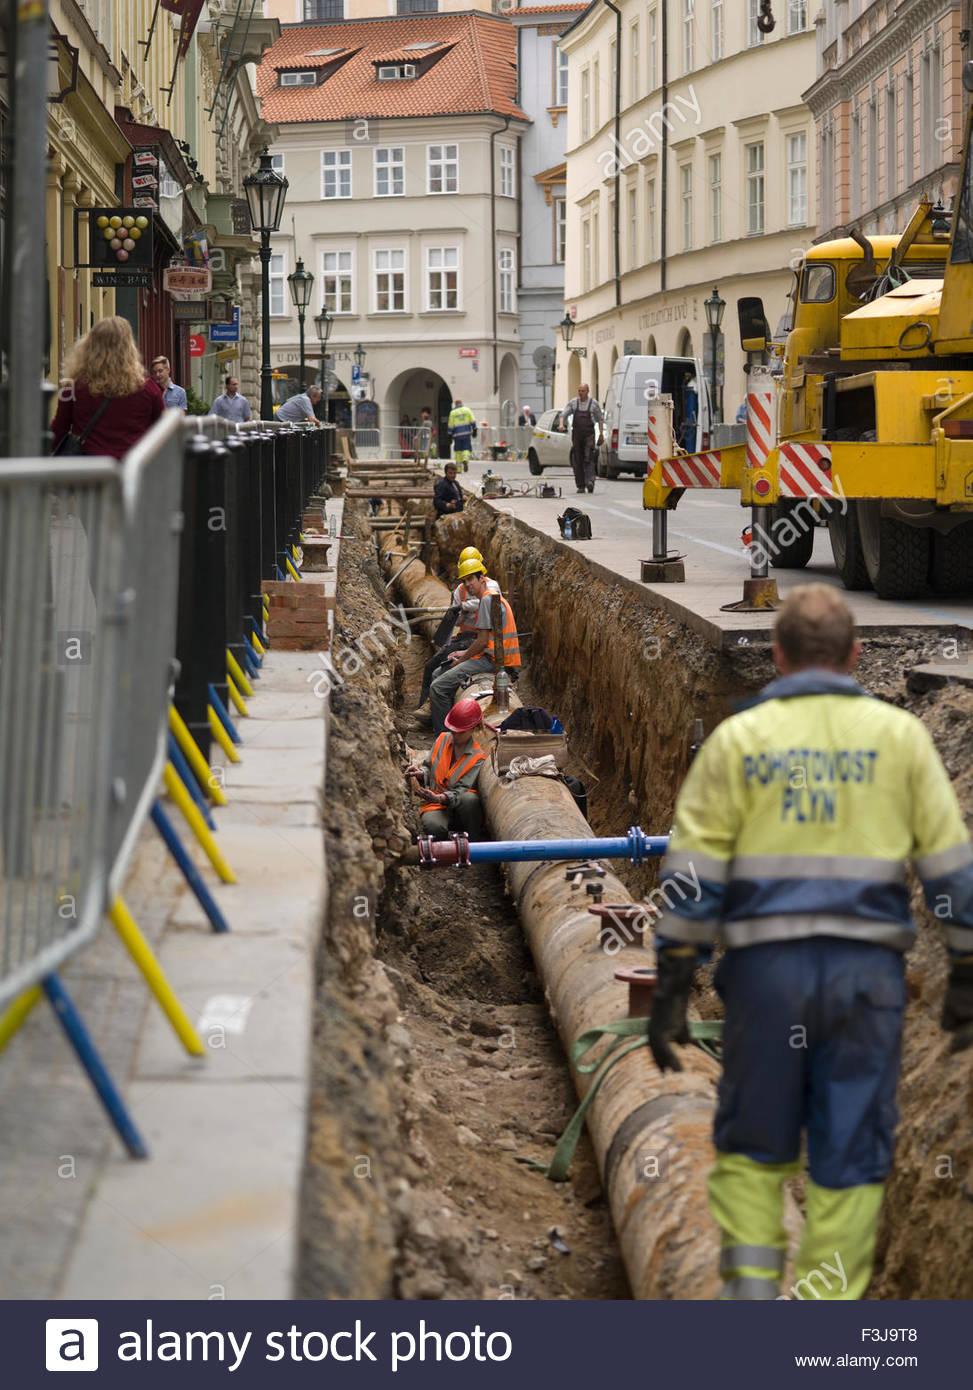 Roadworks People Doing Things - Prague Czech Republic Europe (Medium Format) - Stock Image